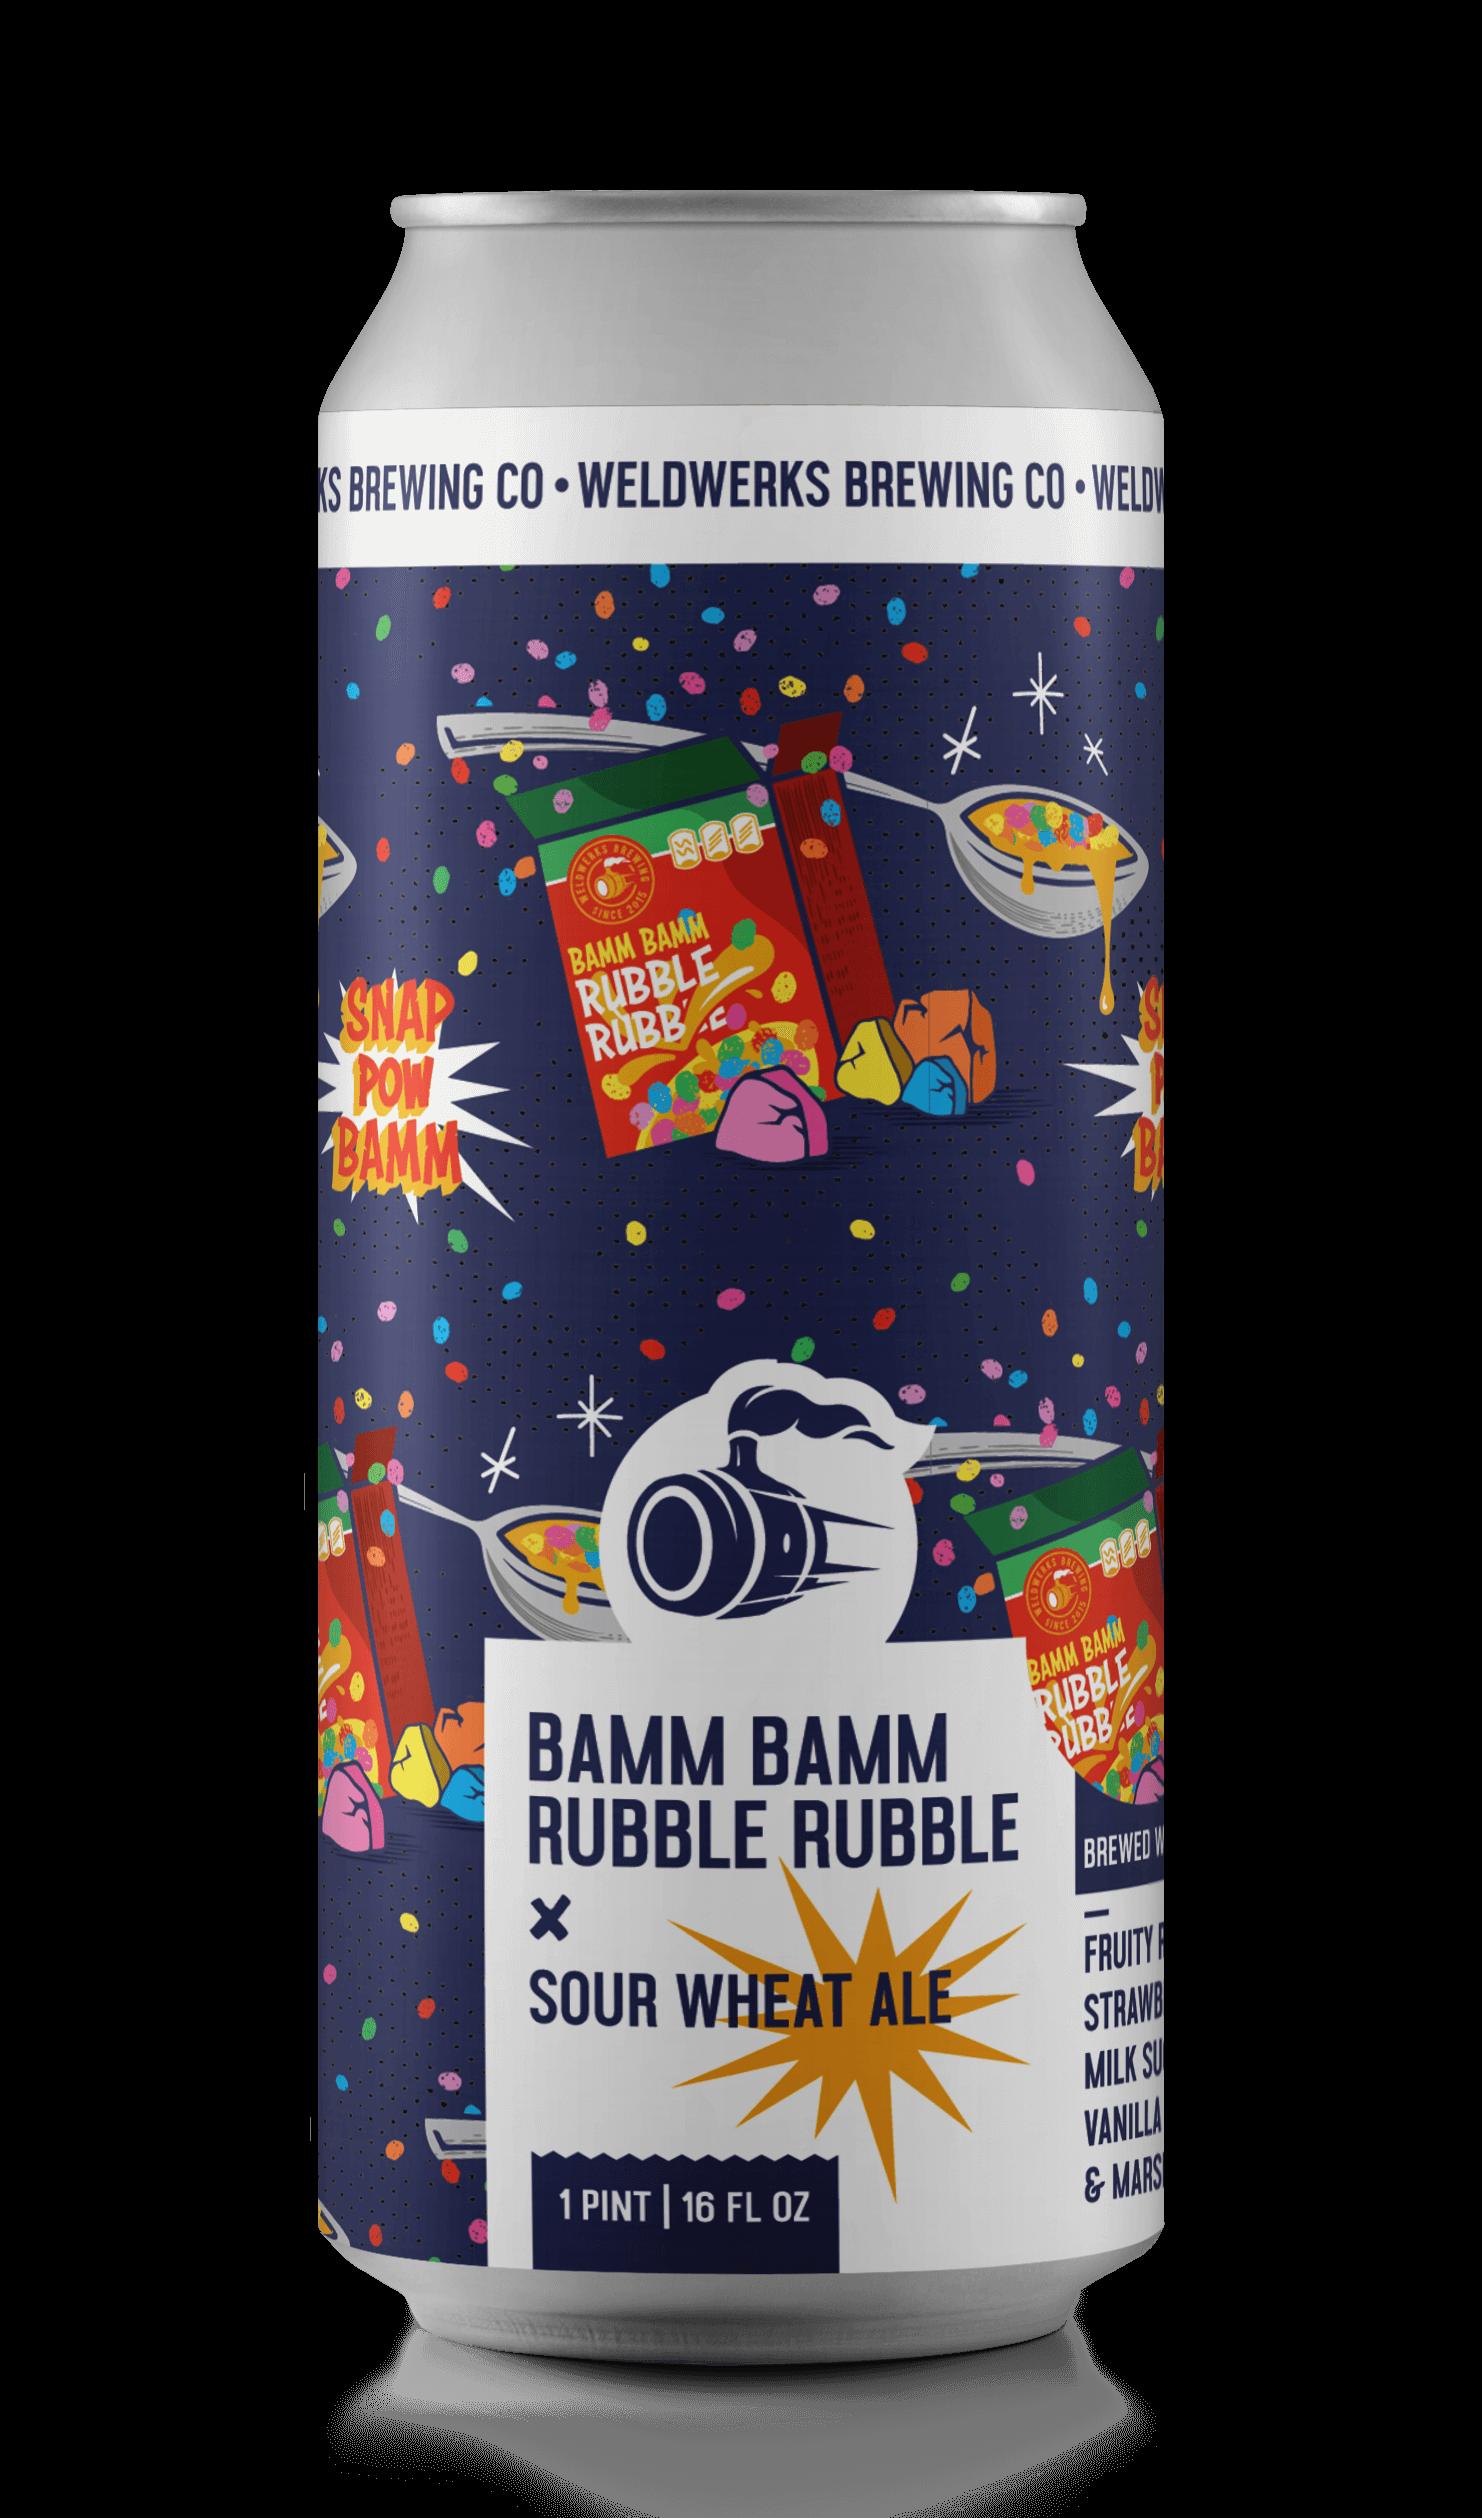 Bamm Bamm Rubble Rubble